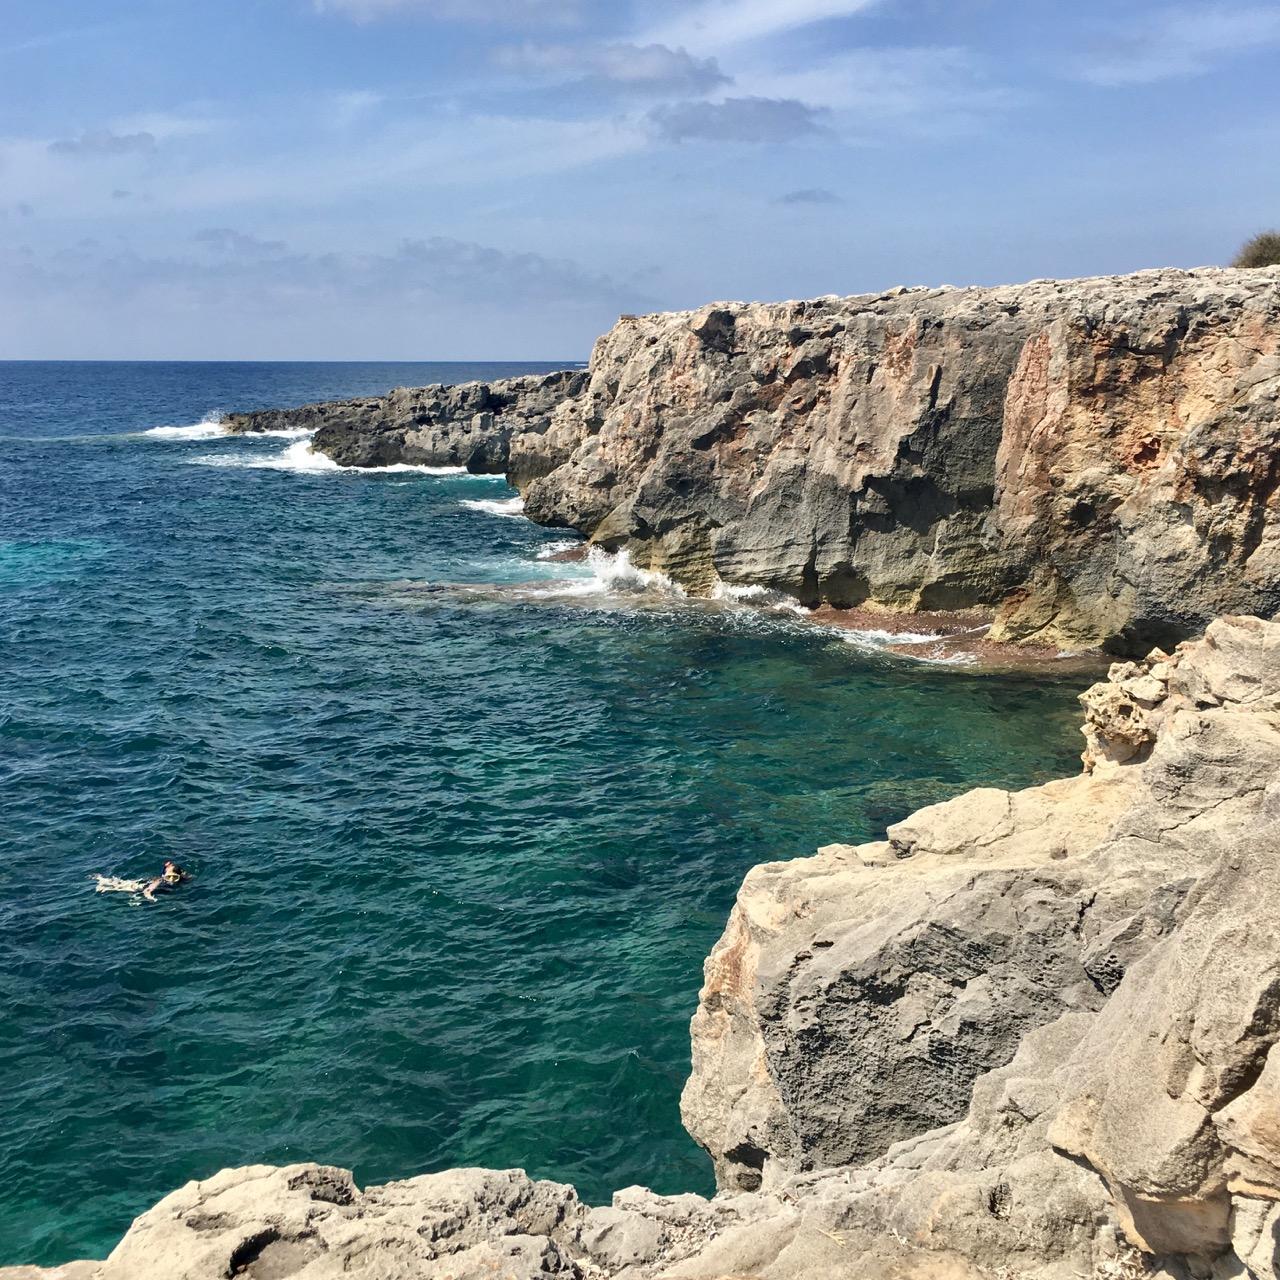 Sea, Menorca, Spain